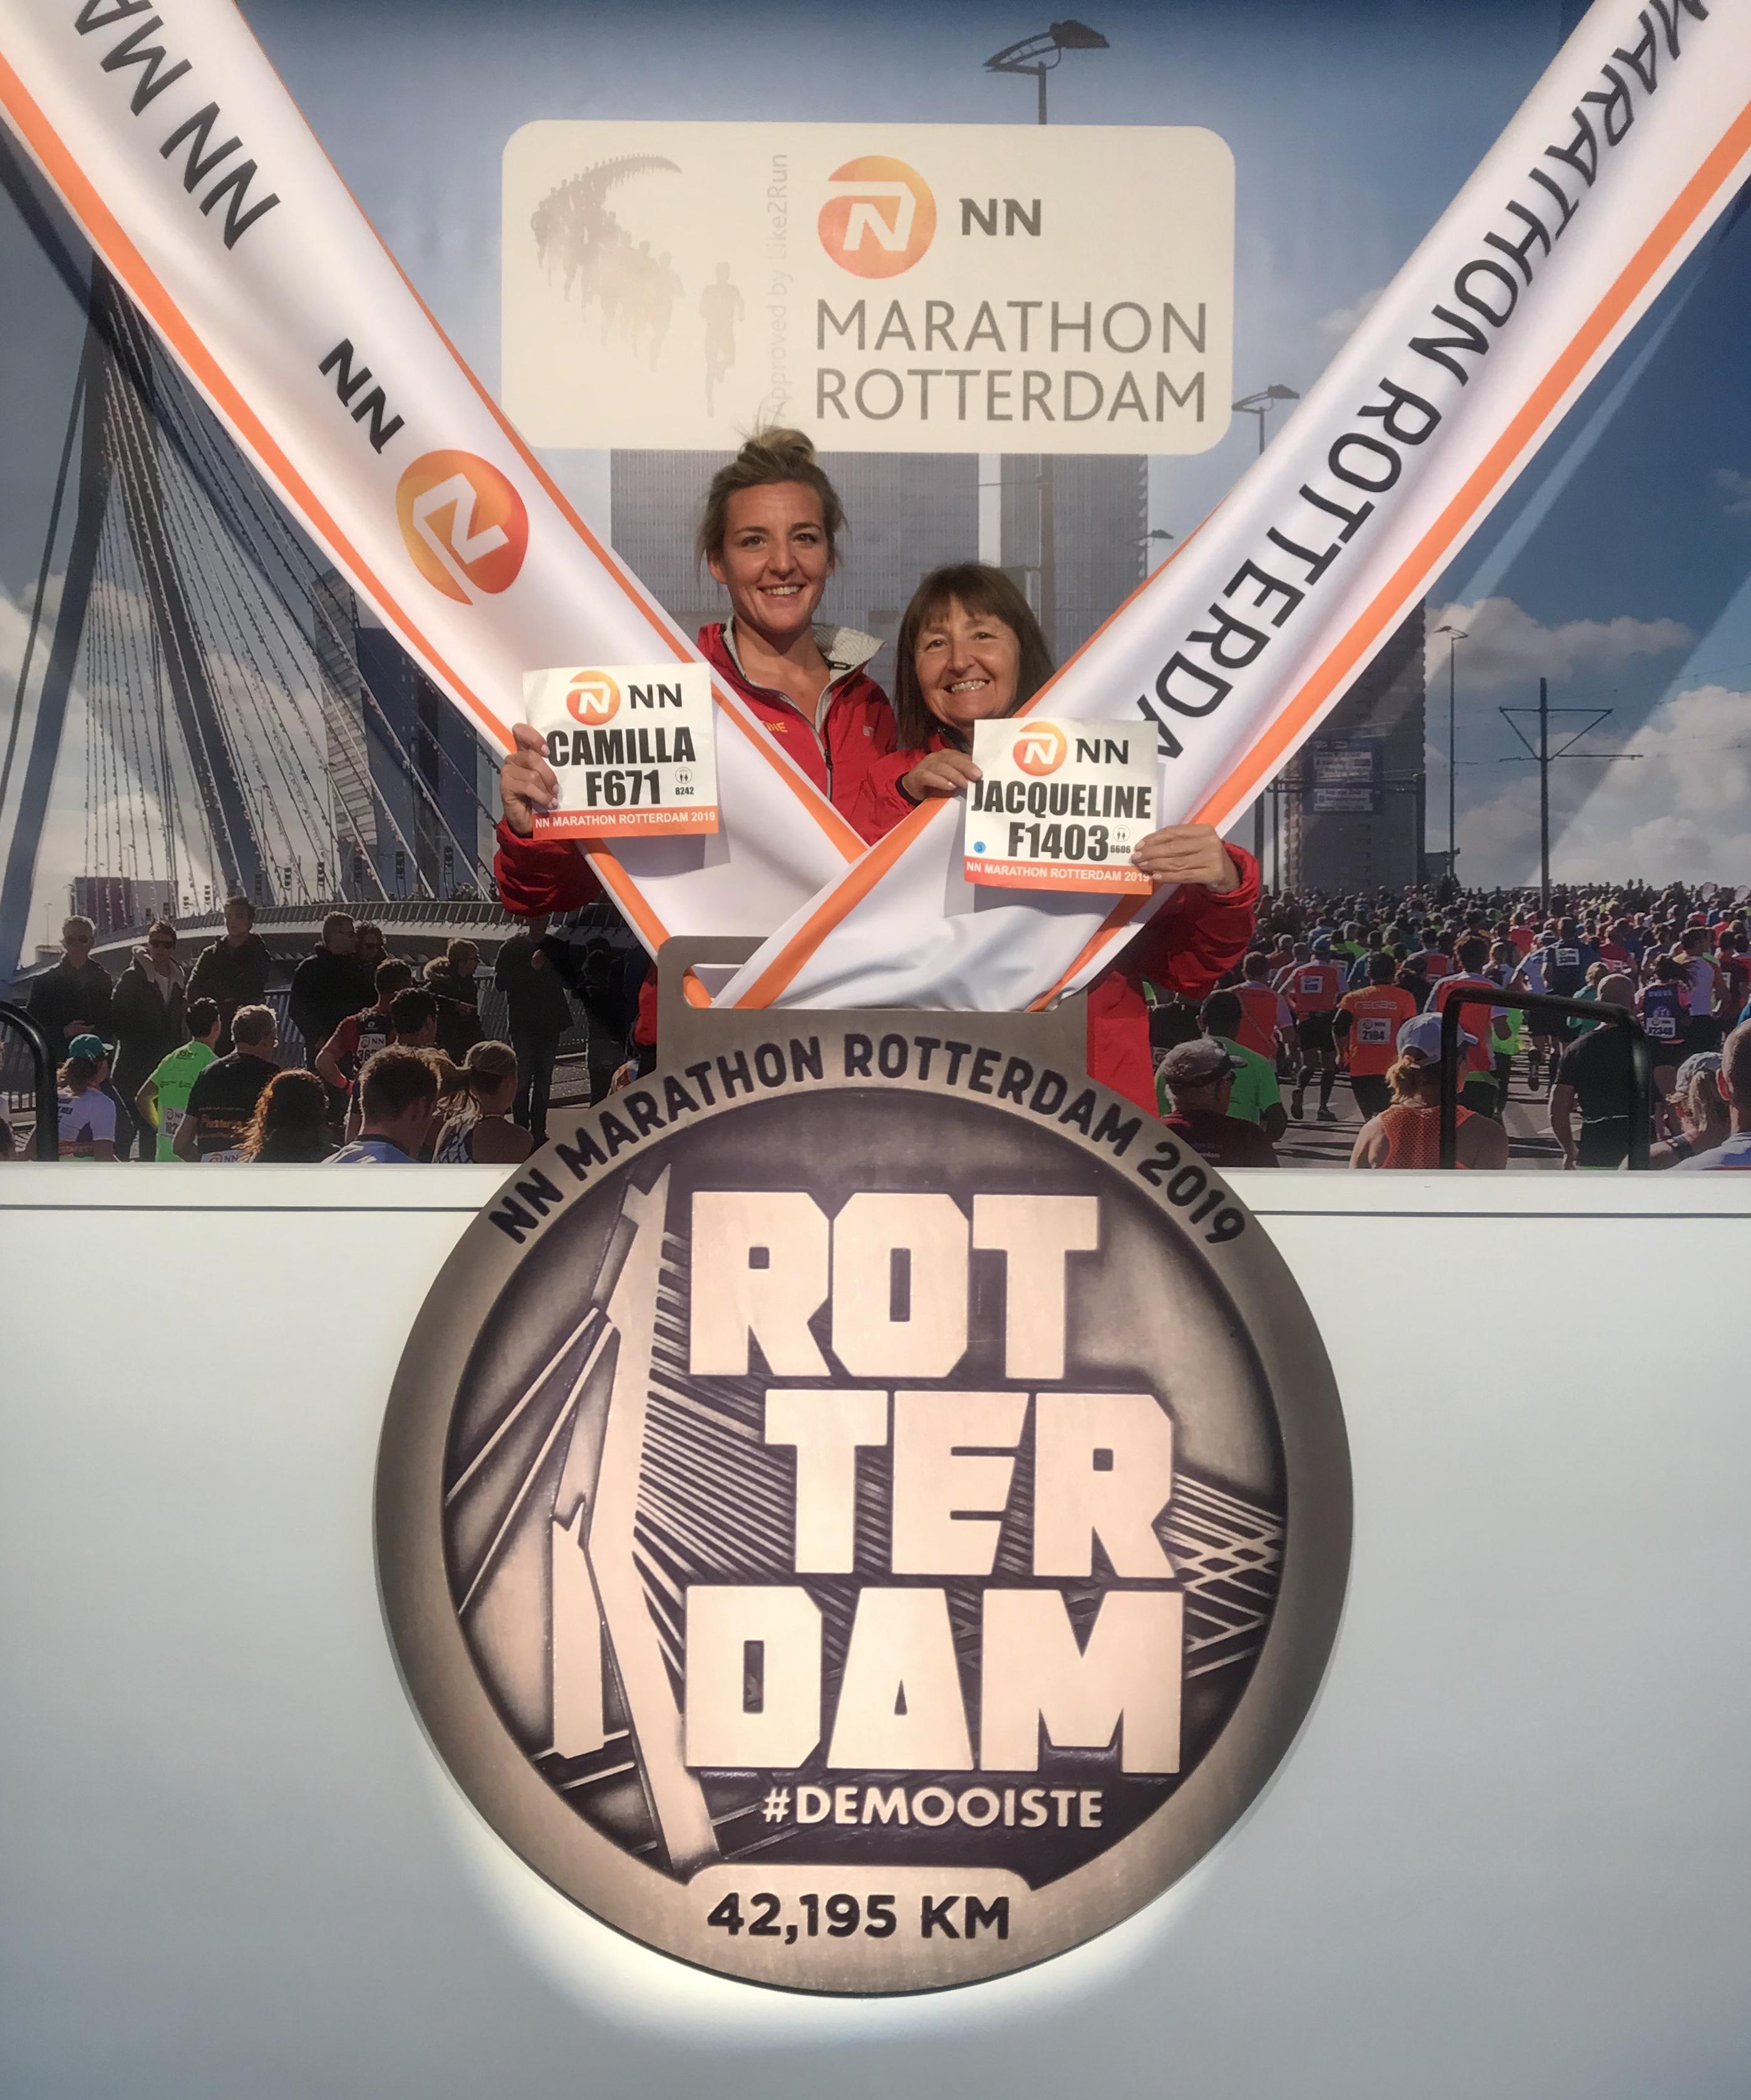 Rotterdam marathon expo - giant medal